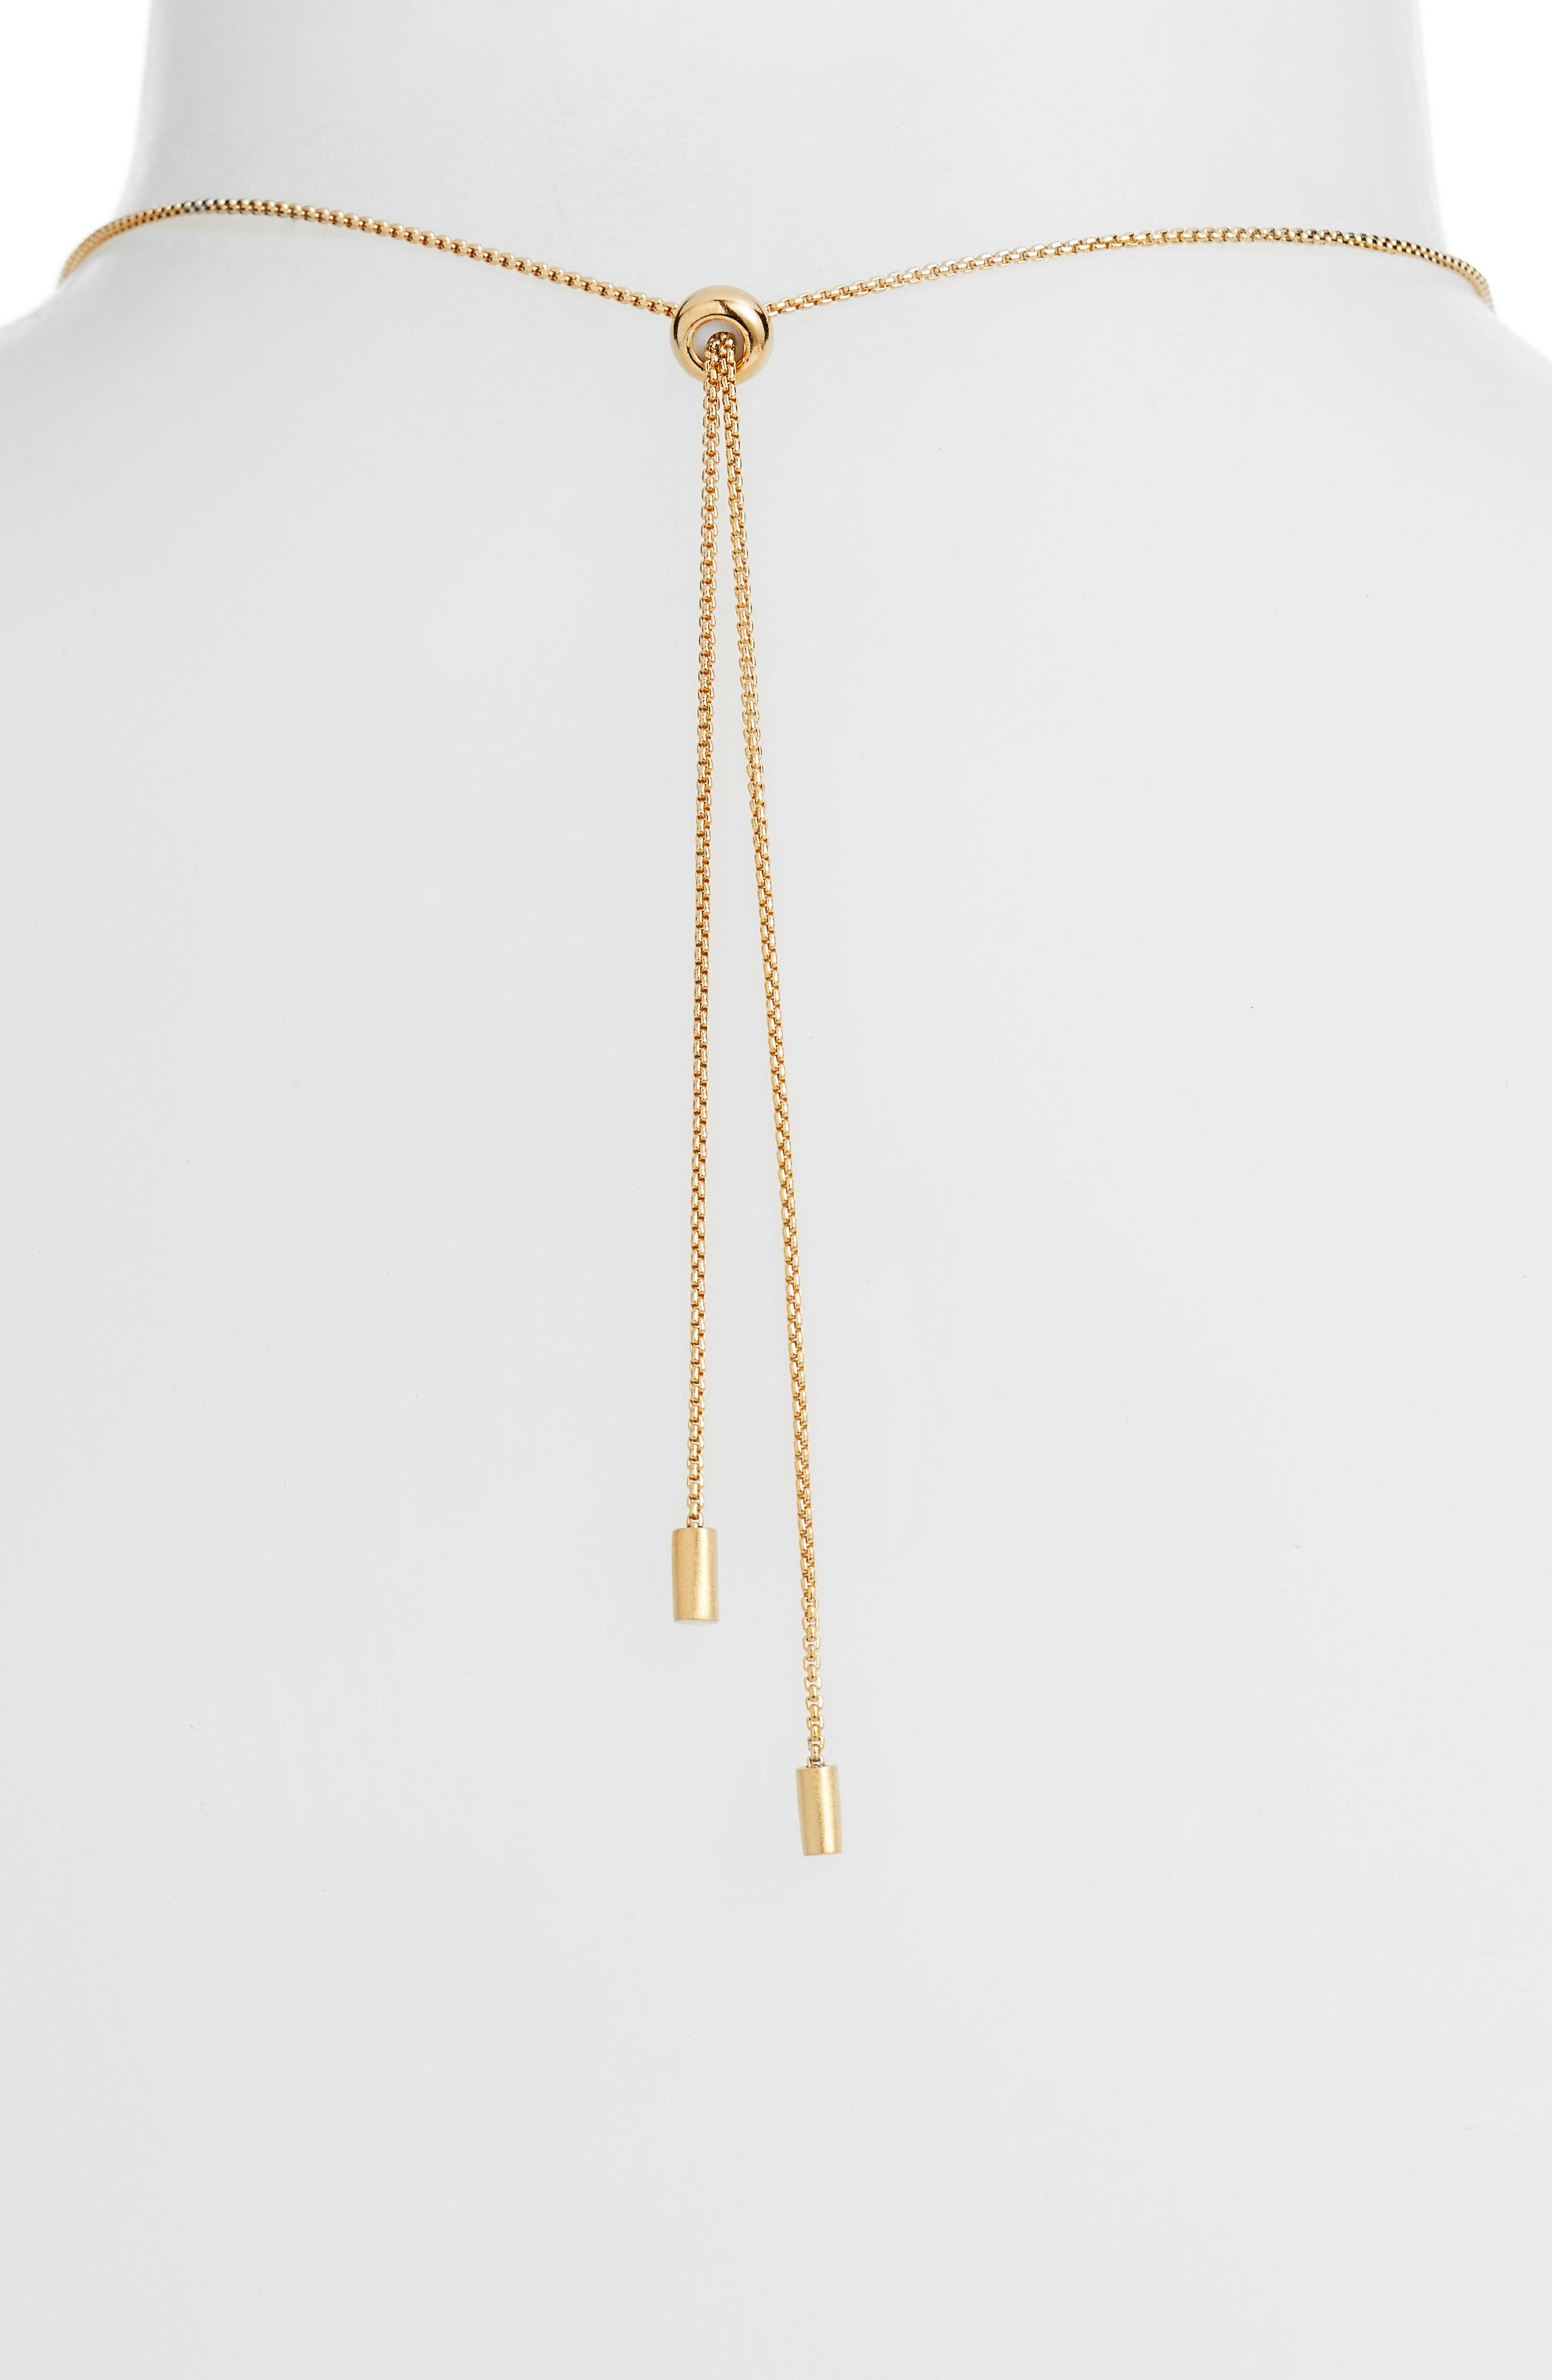 Taj Pendant Adjustable Necklace,                             Alternate thumbnail 4, color,                             GOLD